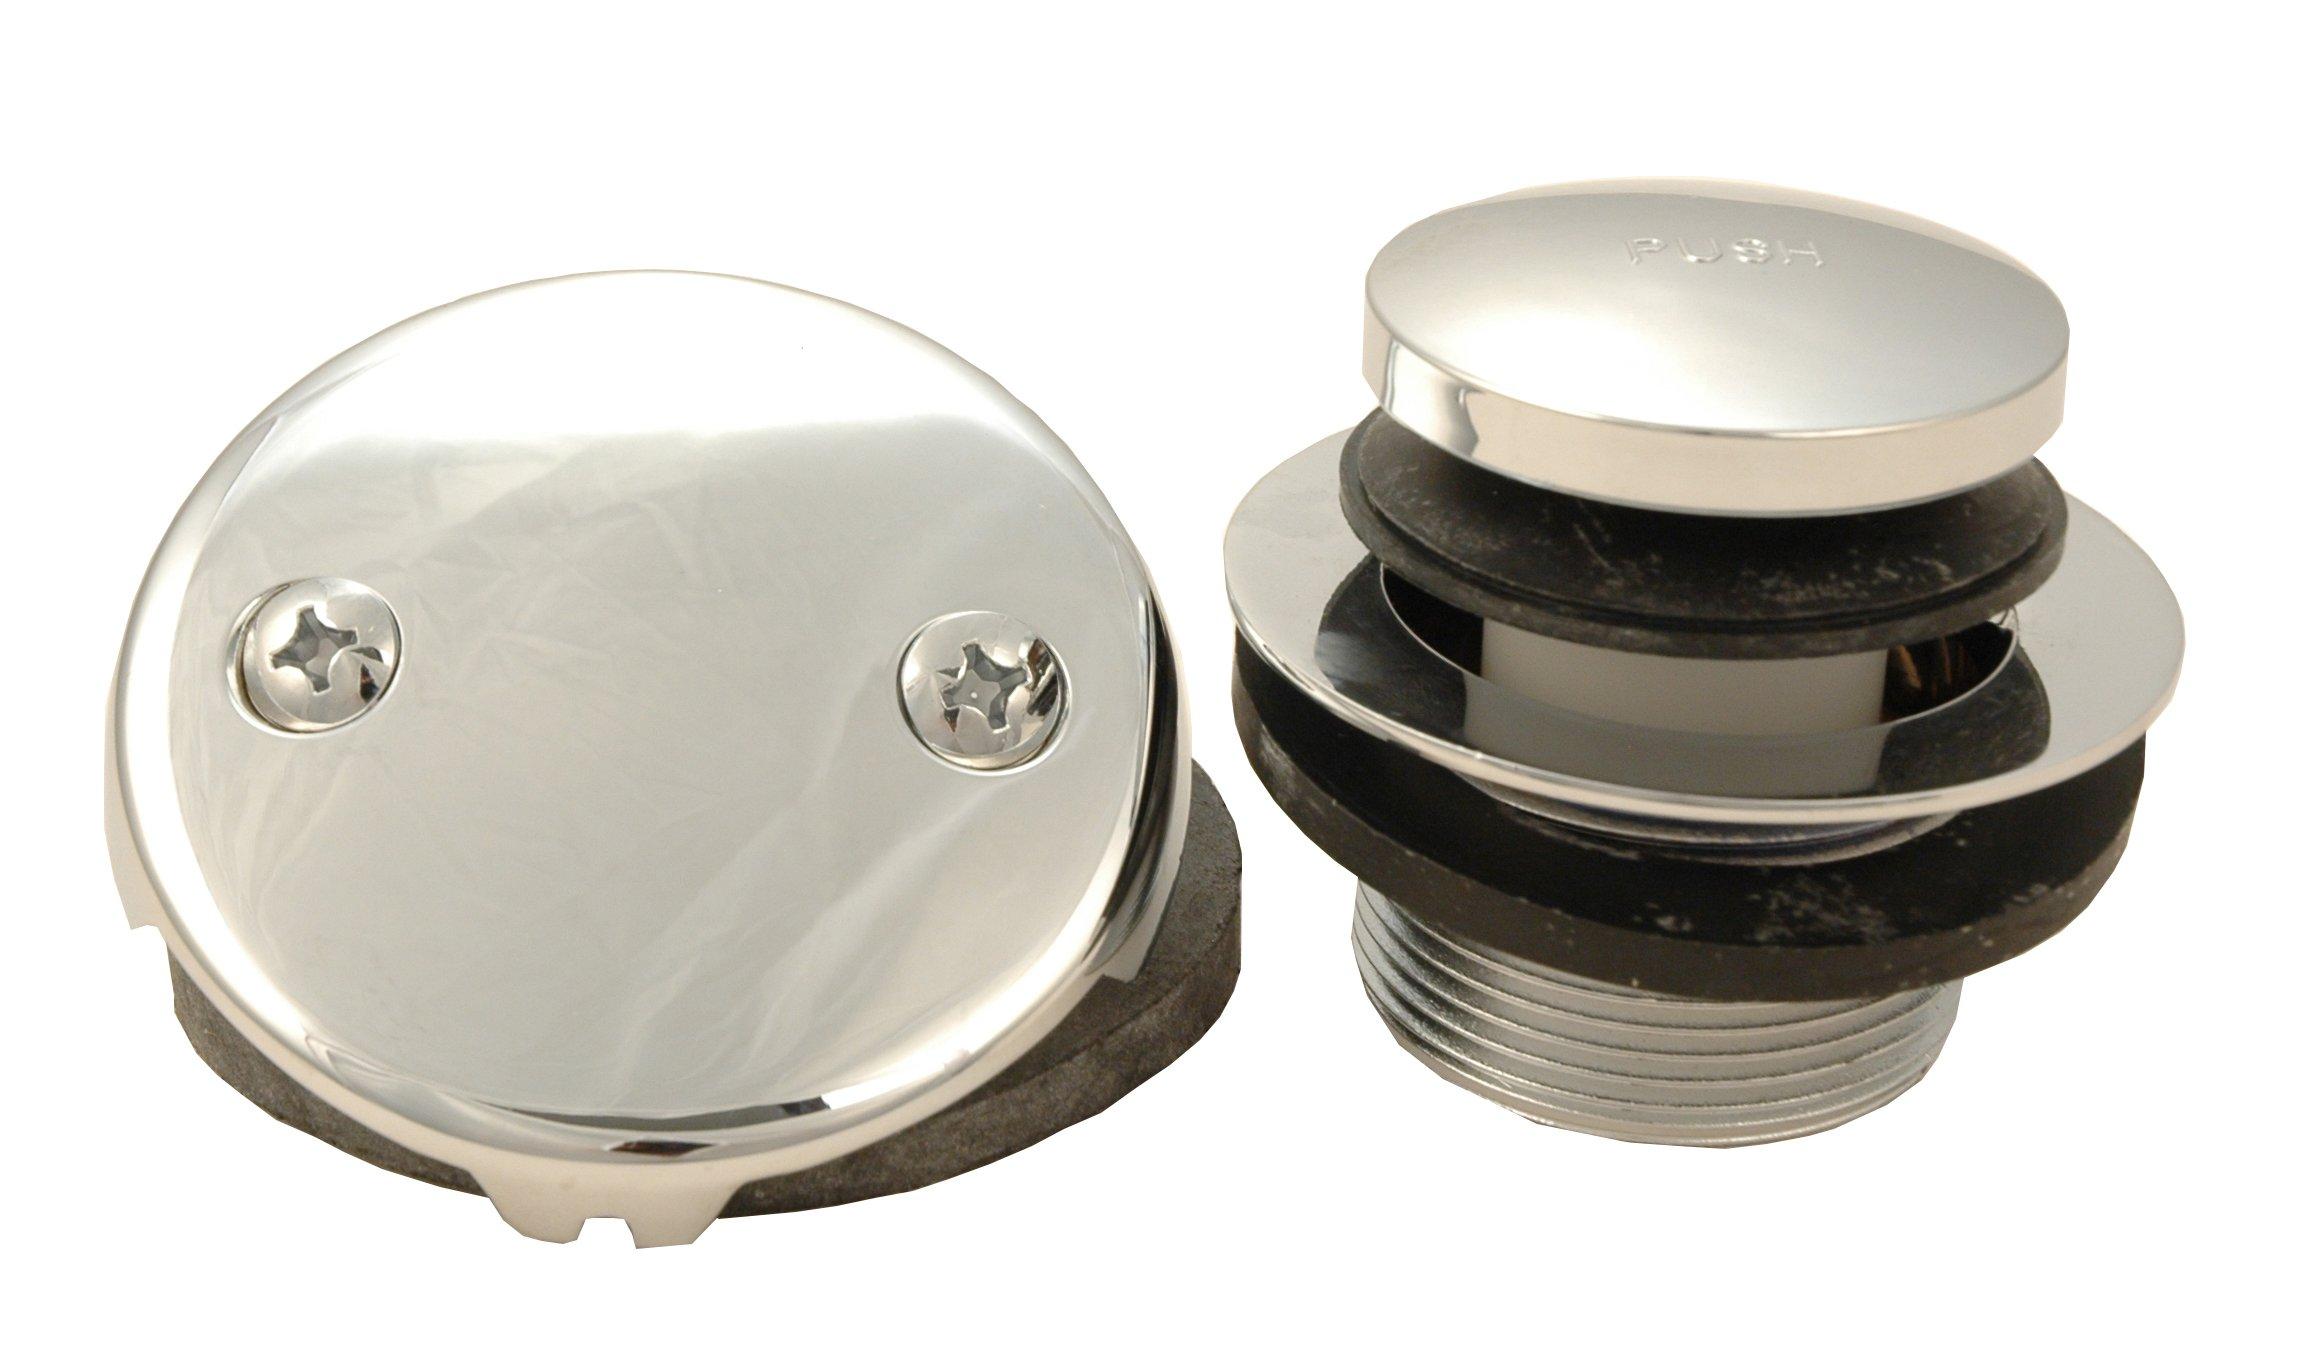 Bathtub Replacement Drain Kit - Chrome Finish, Tip Toe Type - By Plumb USA 51073